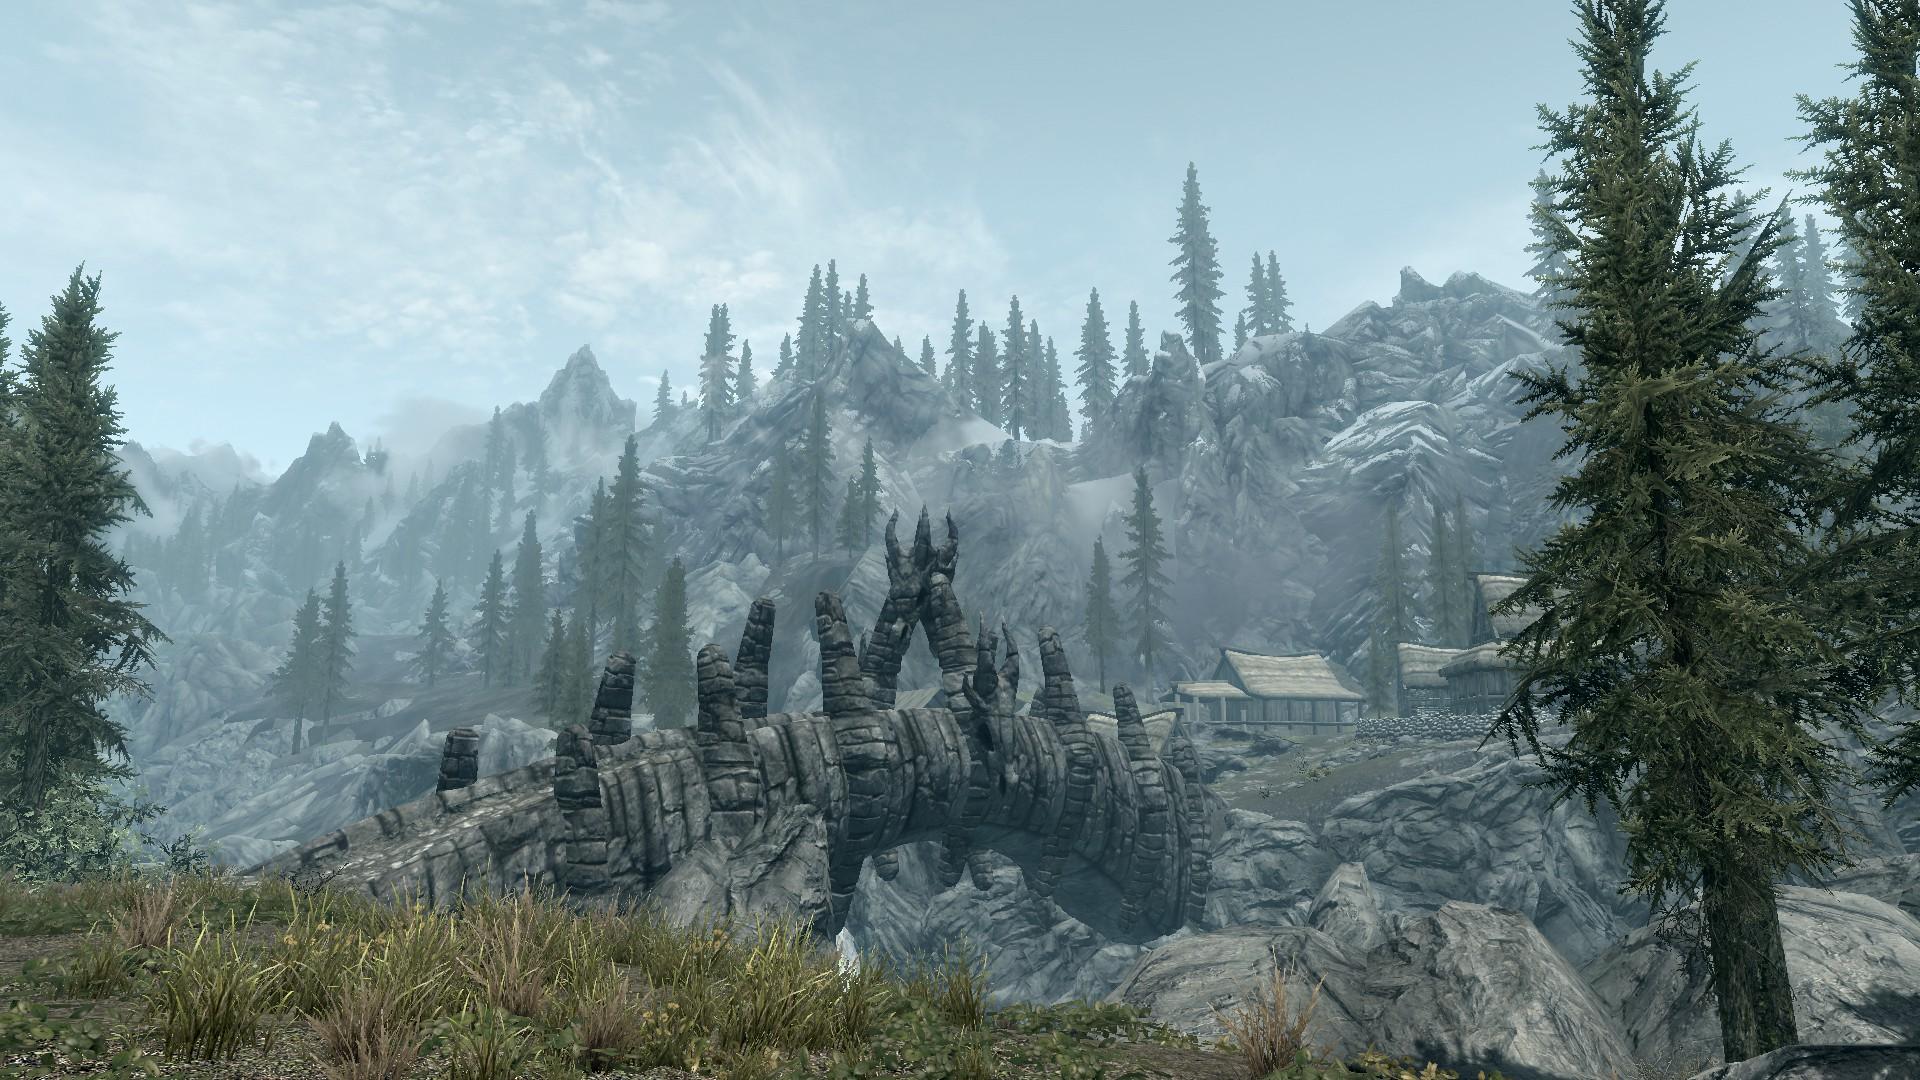 Elder Scrolls V: Skyrim - Wallpaper - 21 by Lonewolf898